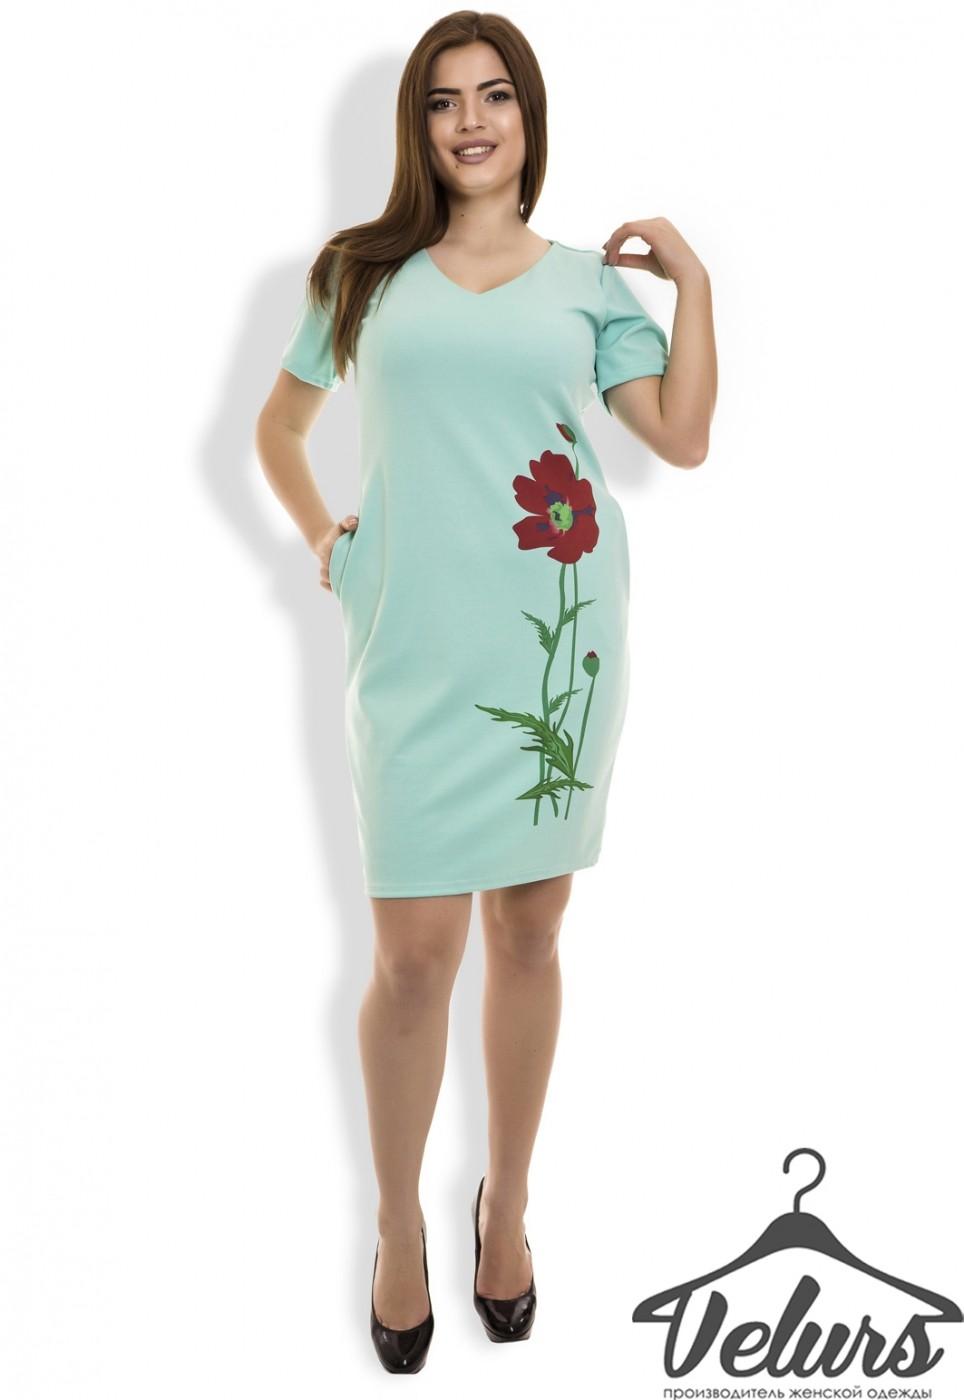 Velurs: Платье 212066 - фото 4